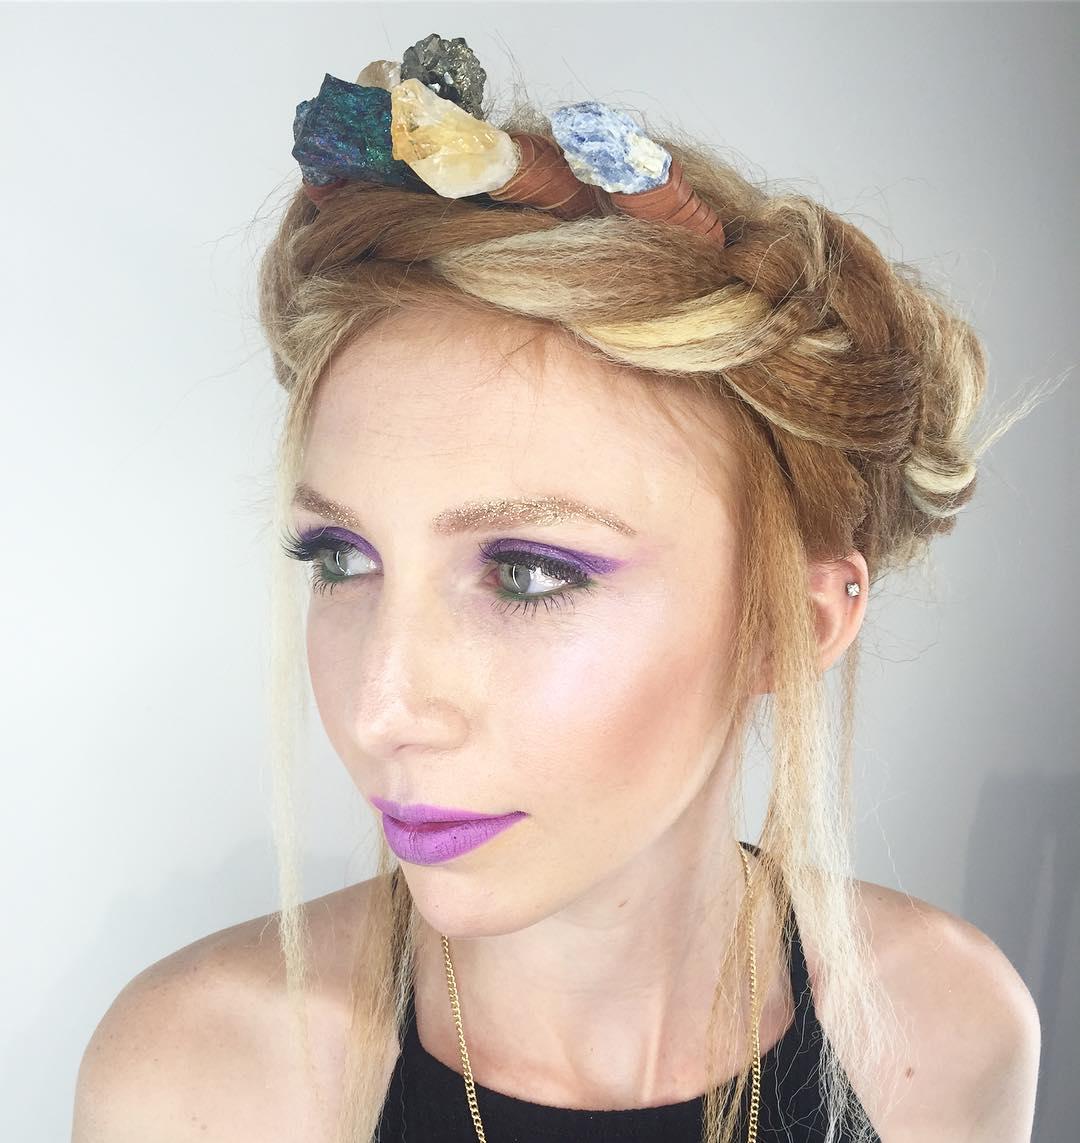 chitabeseau-boho-crown-braid-updo-with-crystals